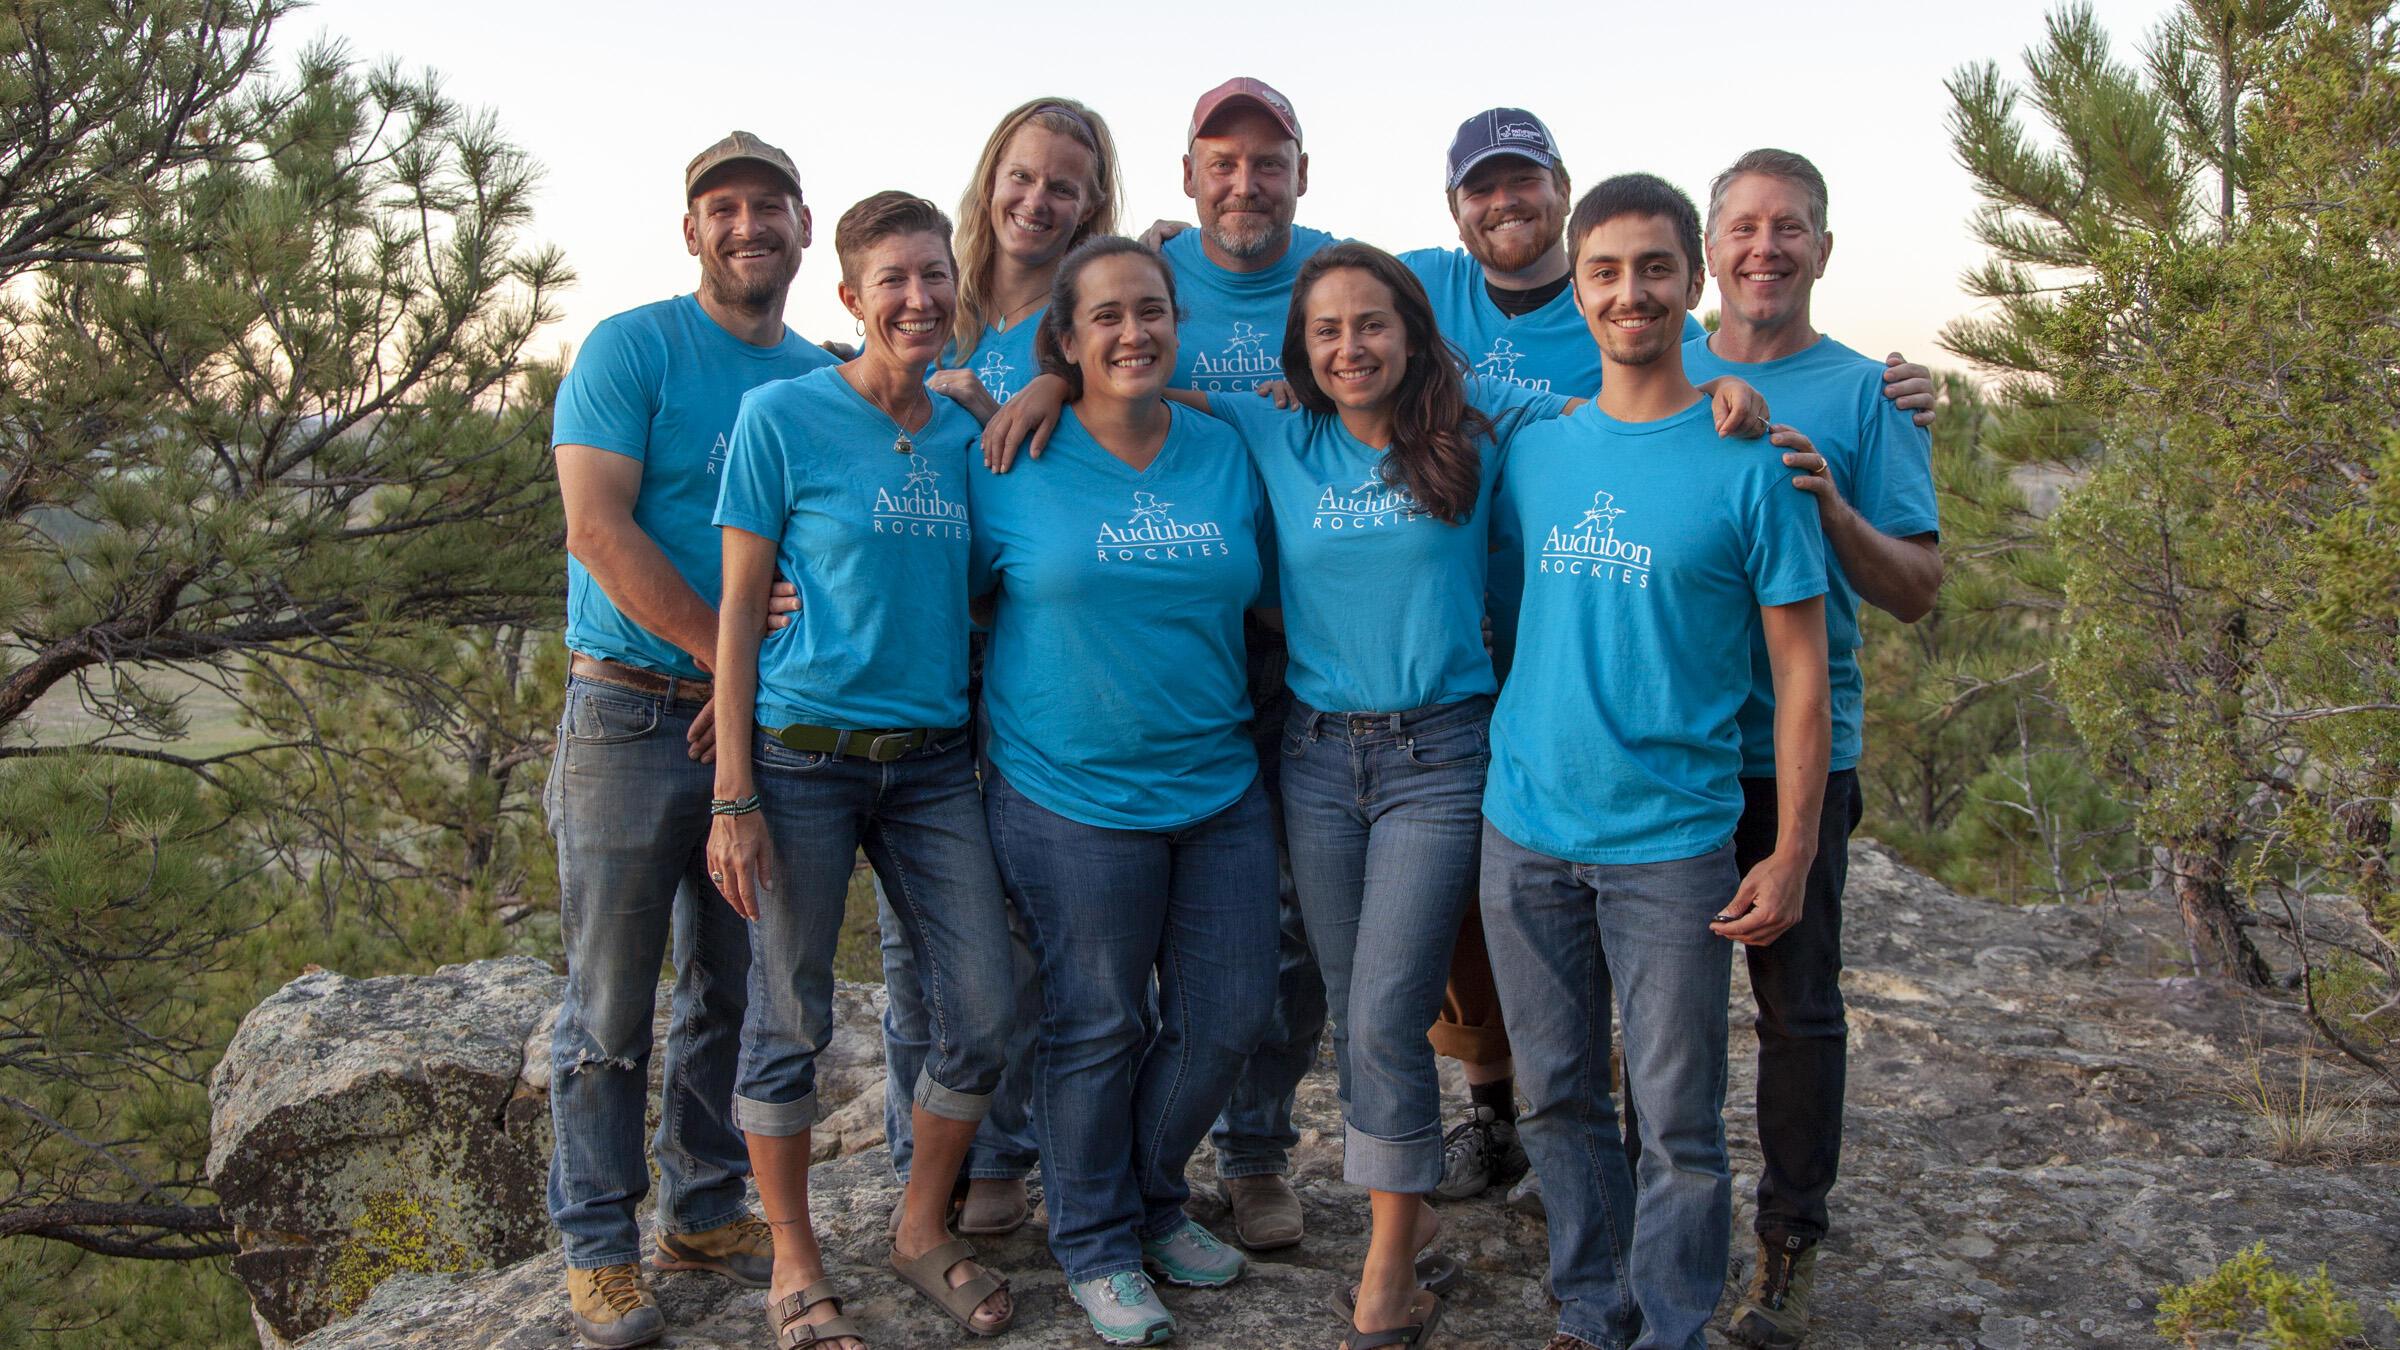 Audubon Rockies Staff